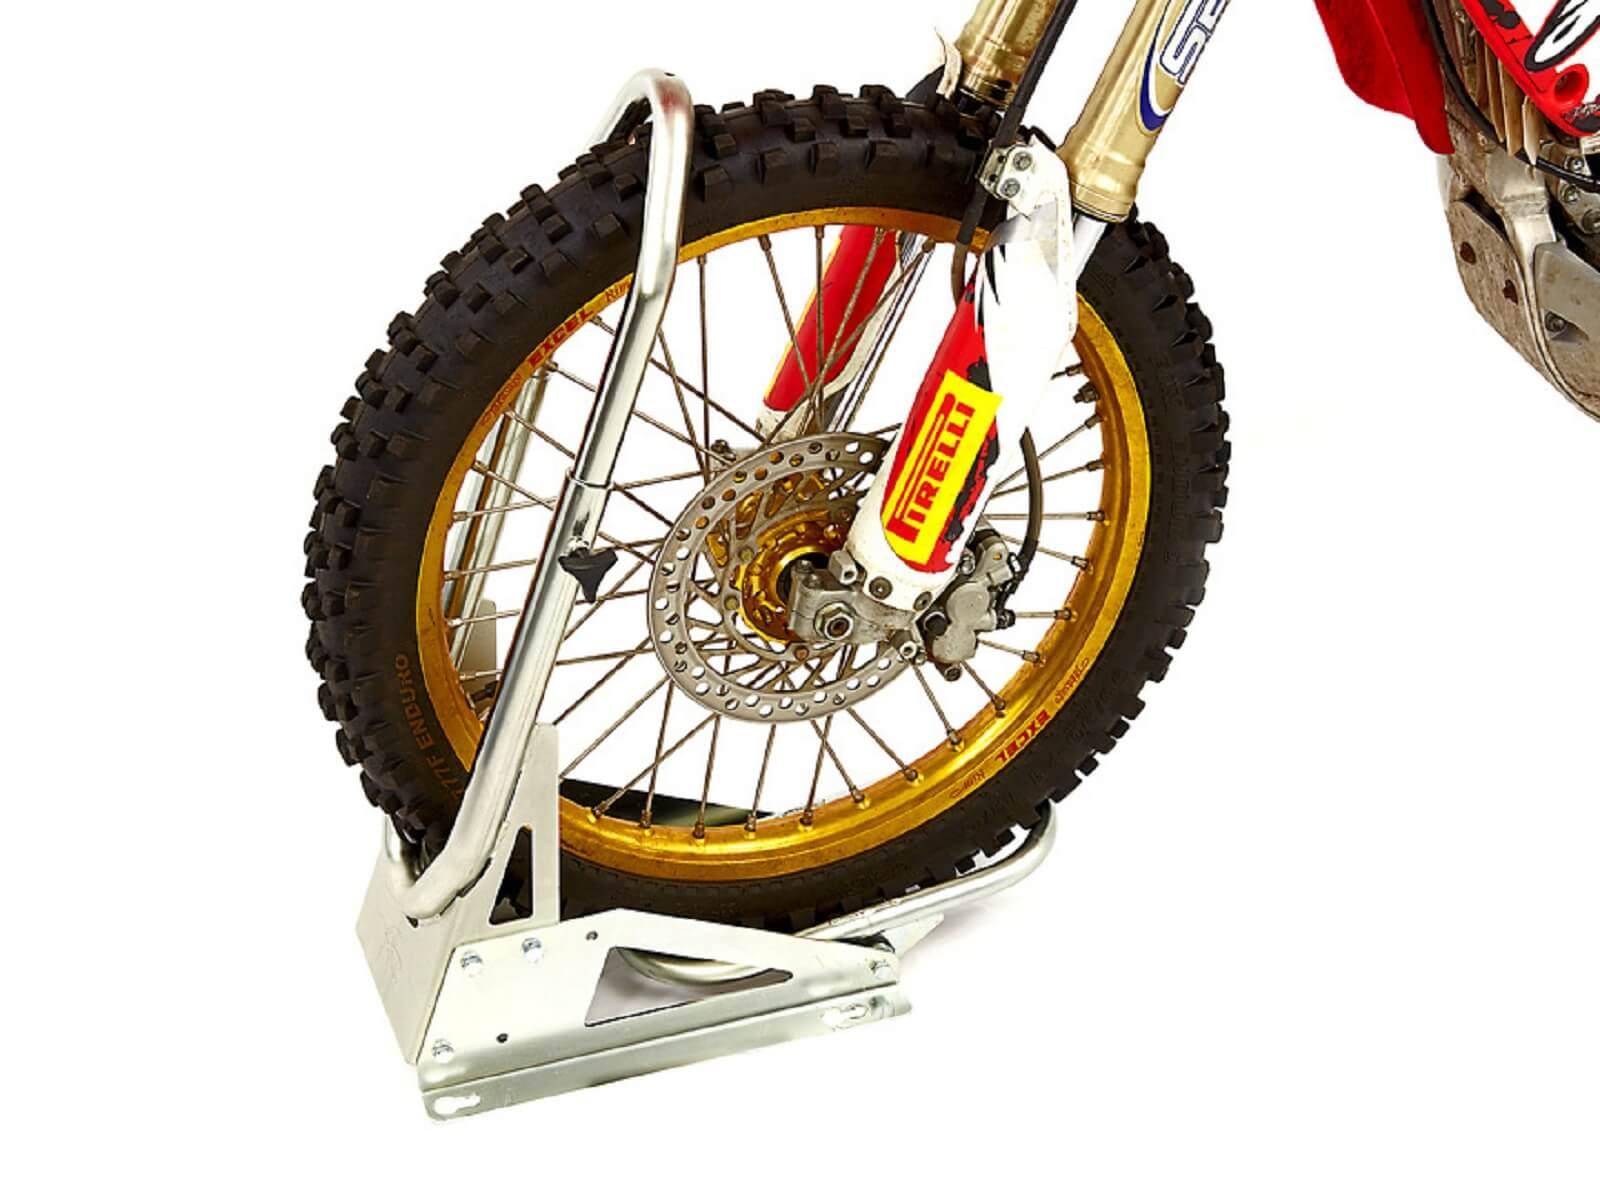 Acebikes Steadystand Cross Basic Crosswippe 18 bis 21 Zoll